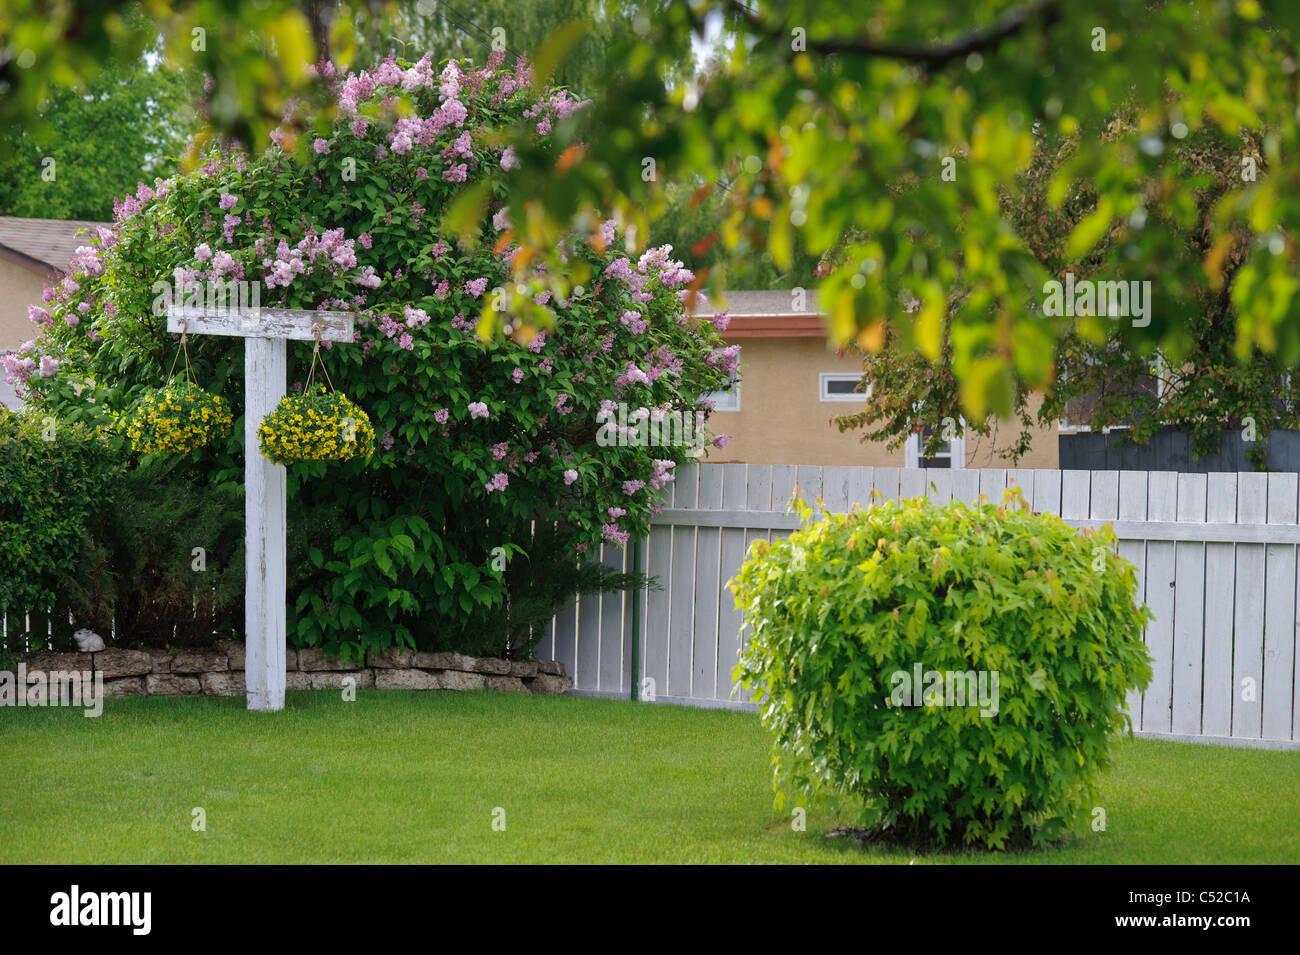 Suburban backyard in with flowers in Lethbridge Alberta - Stock Image